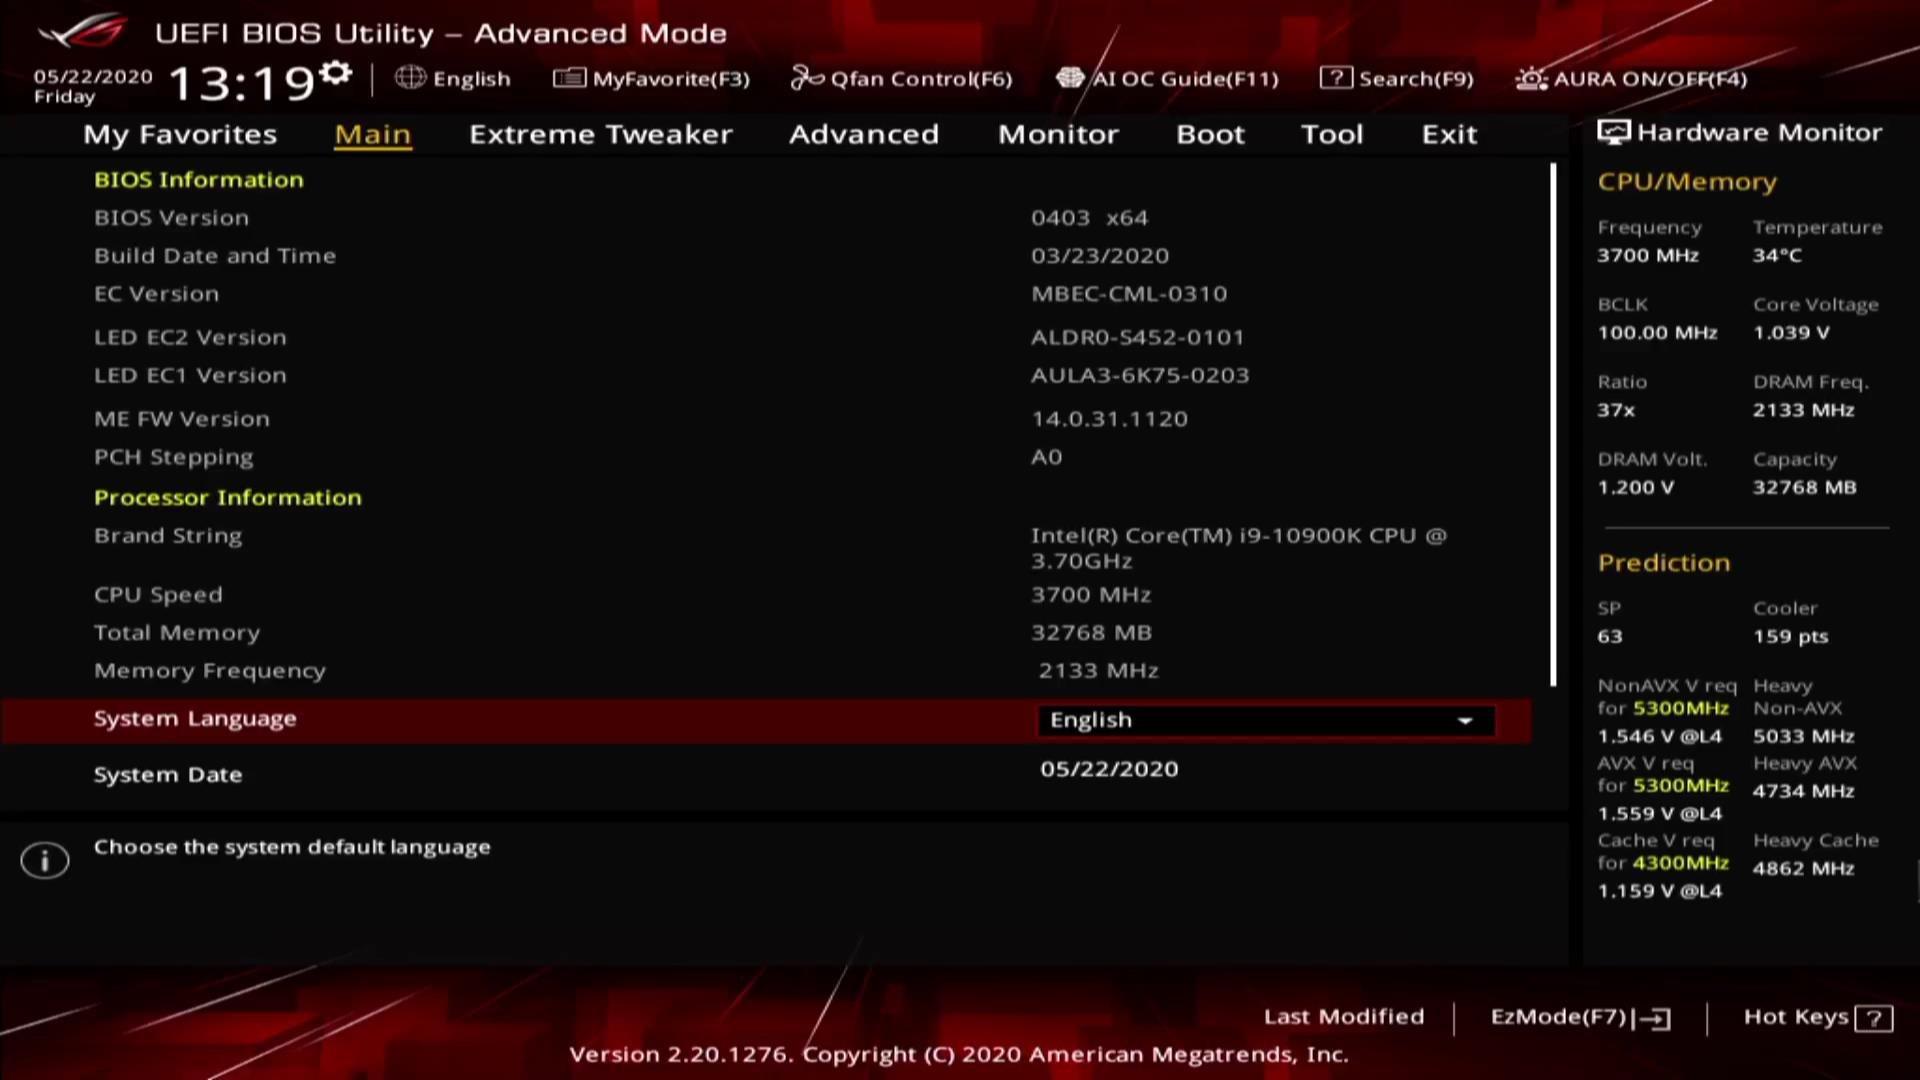 ASUS ROG Maximus XII Hero Wi-Fi